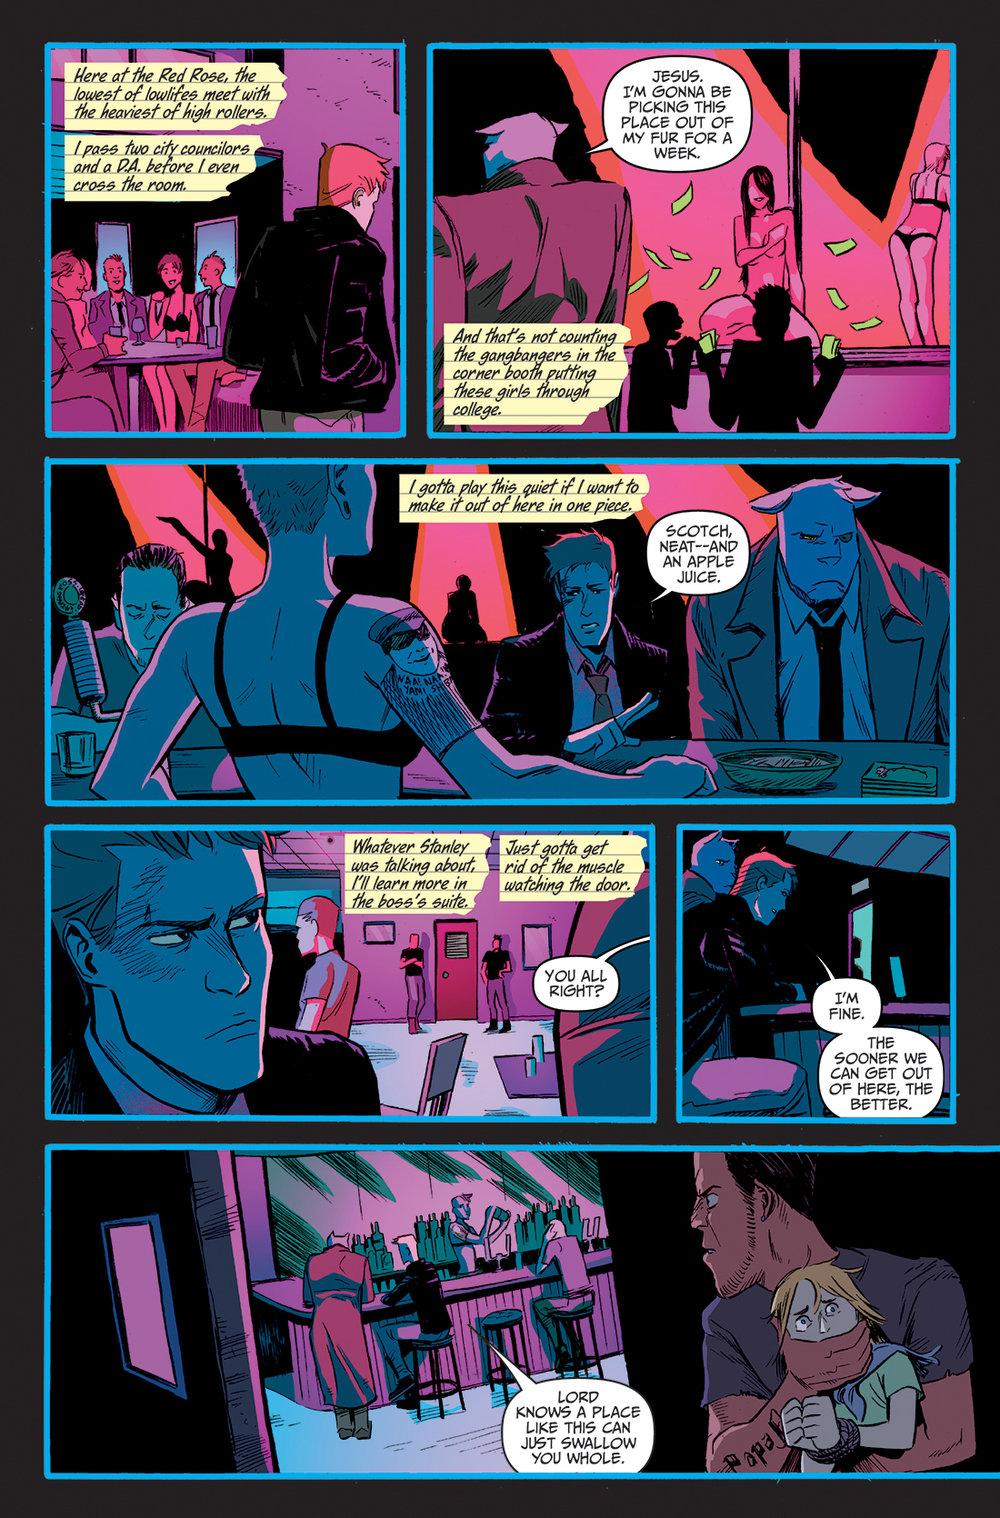 Spencer & Locke #2 Page 6.jpg